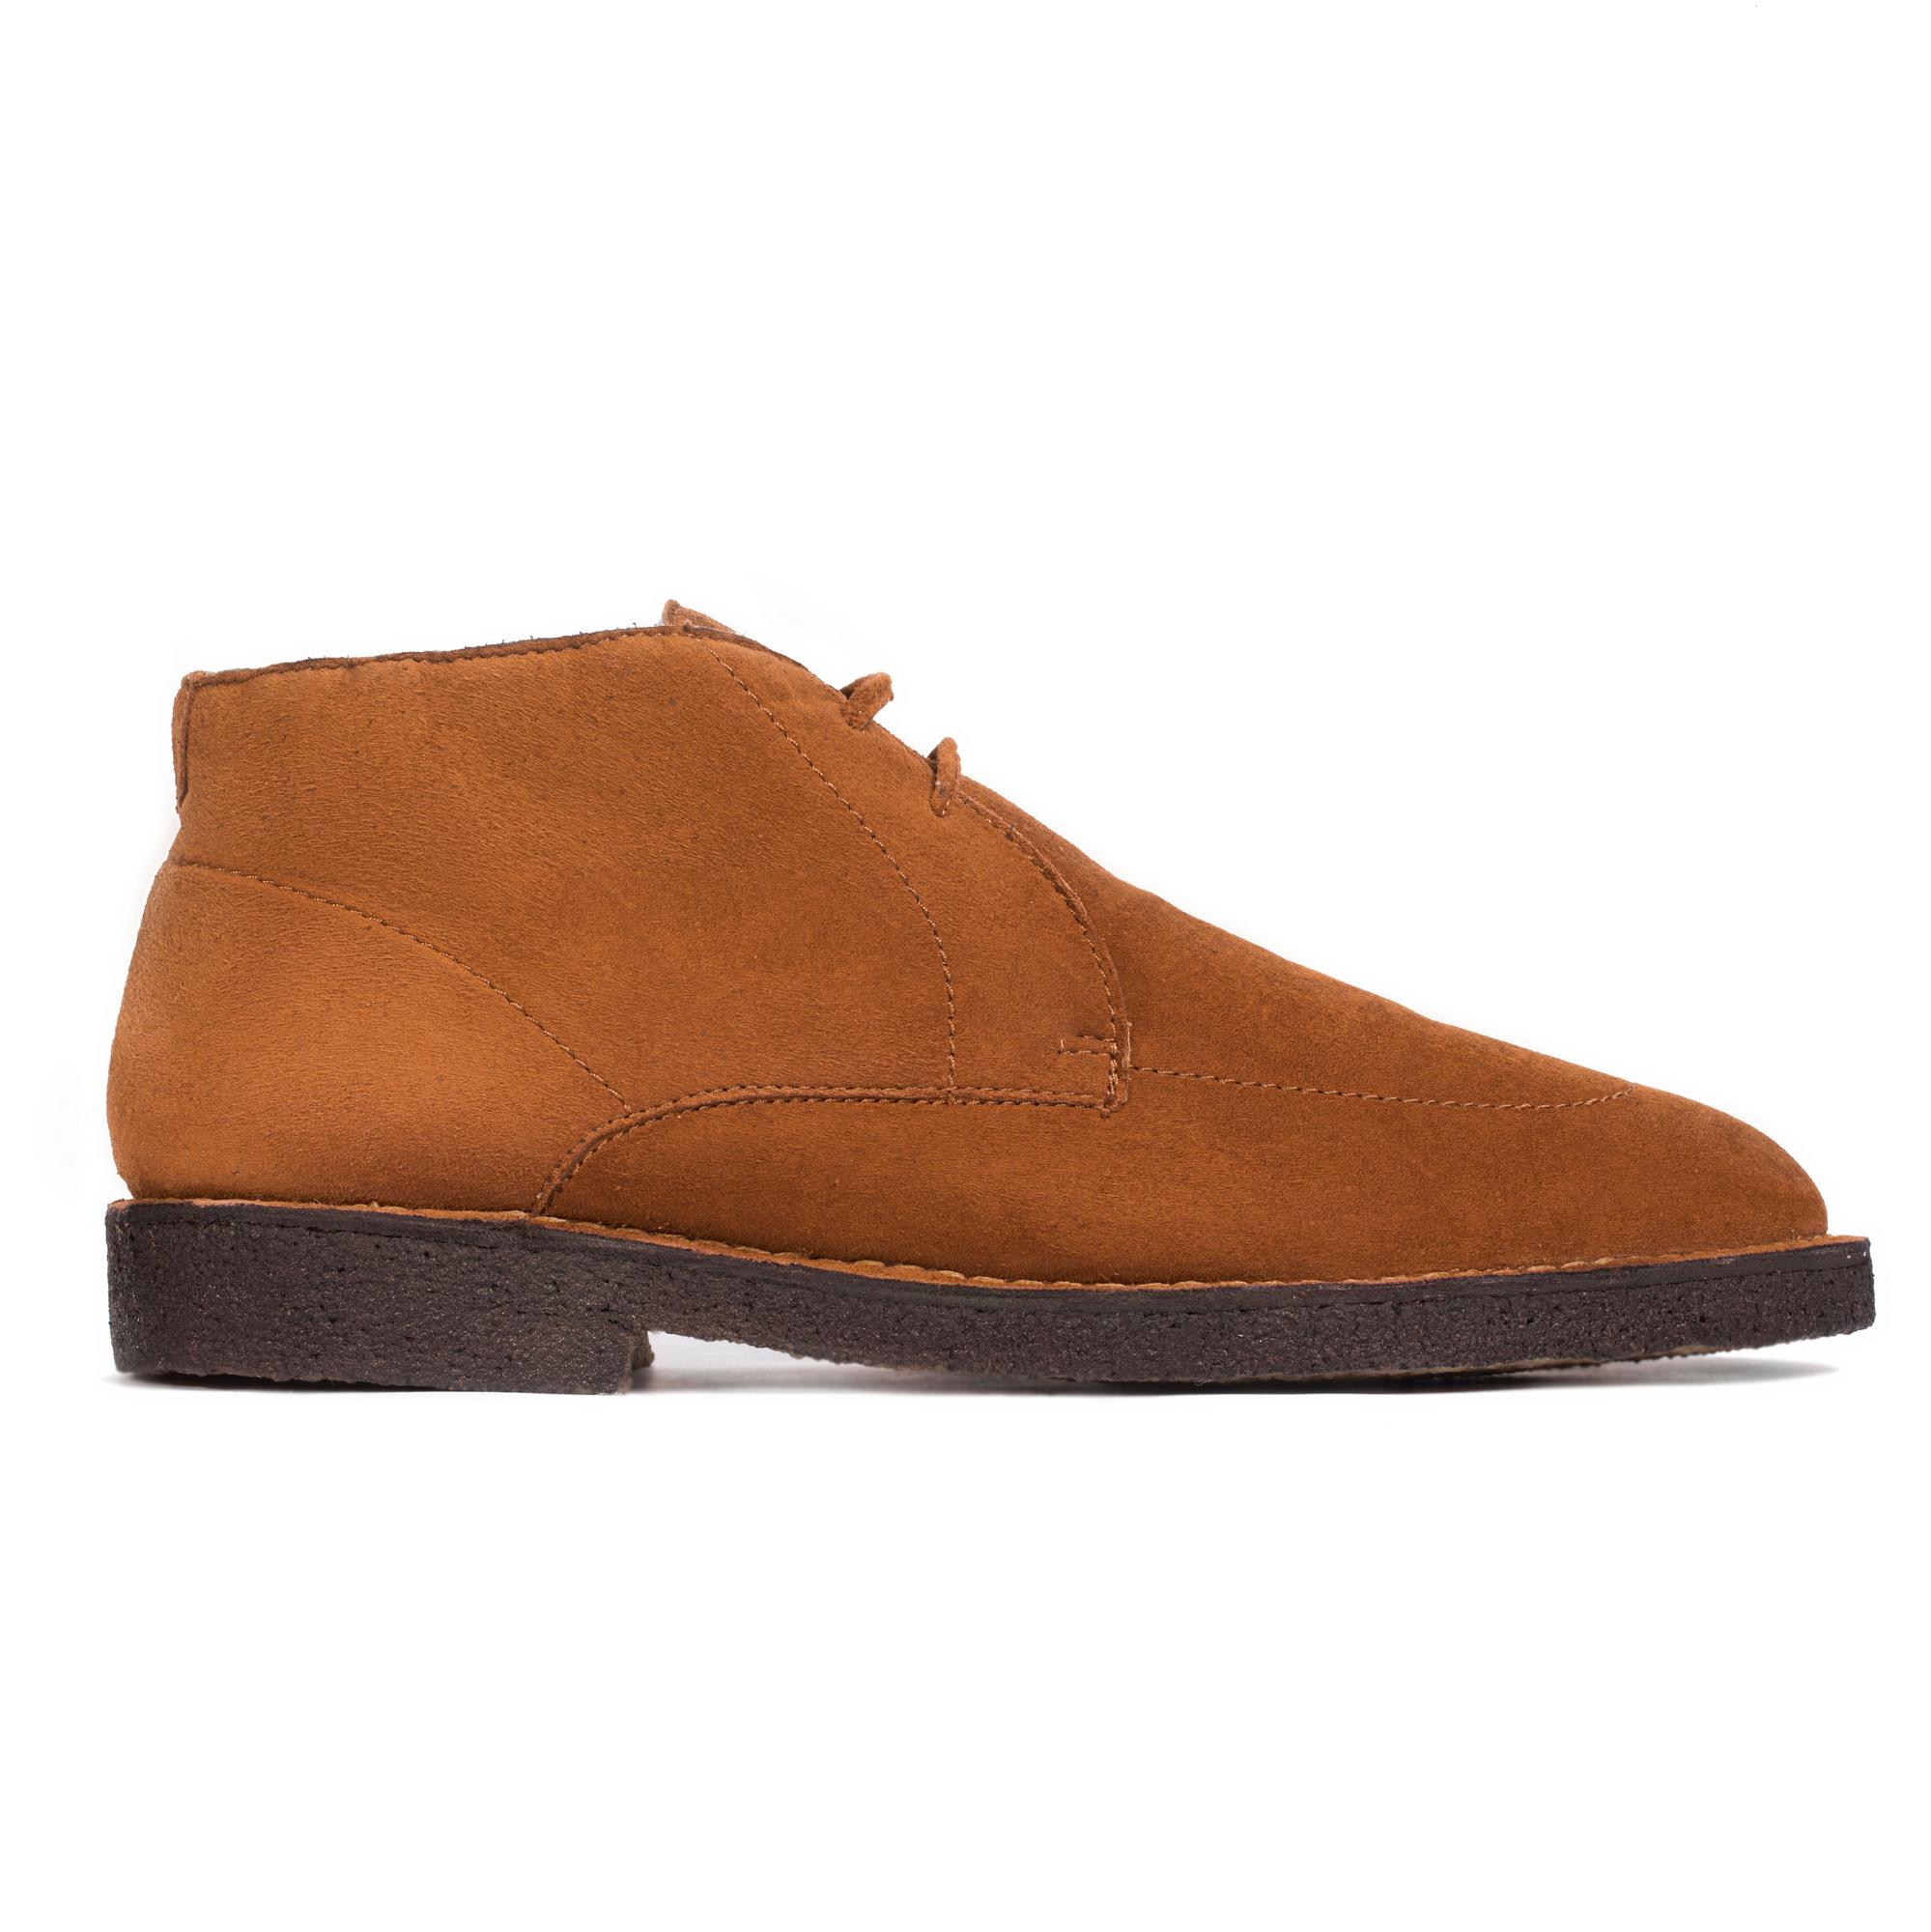 CORSOCOMO Ботинки-чукка из замши коричневого цвета с мехом 88-317-4116-7m